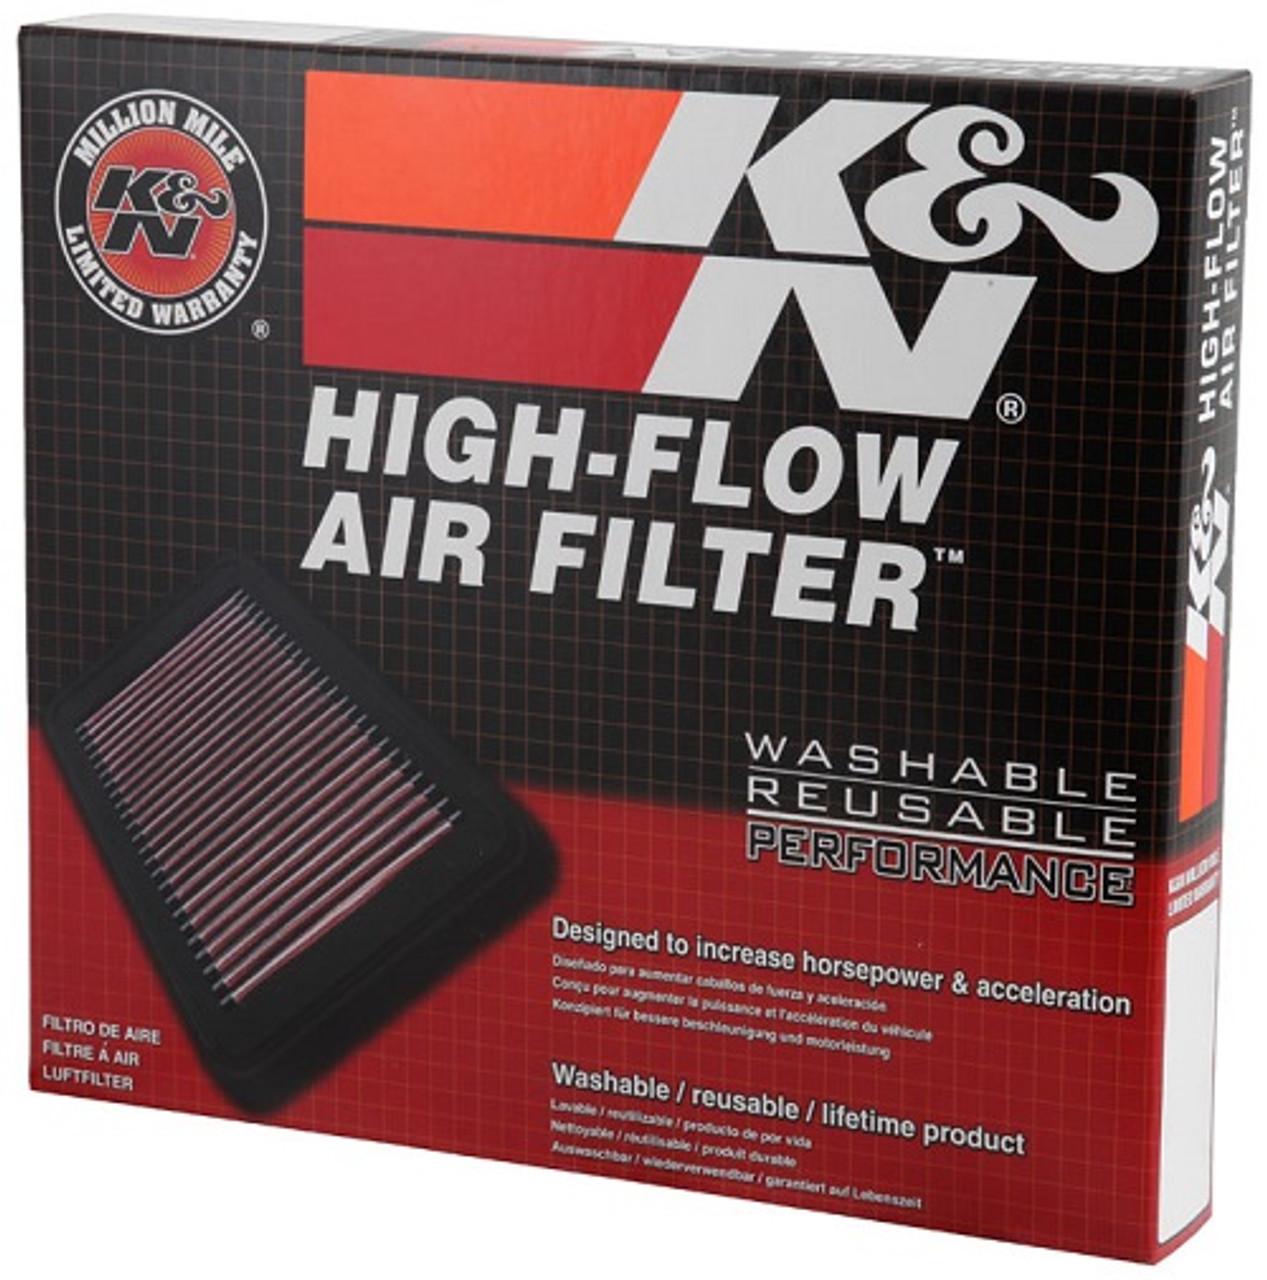 33-2787 REPLACEMENT HIGH FLOW FILTRATION KN AIR FILTER